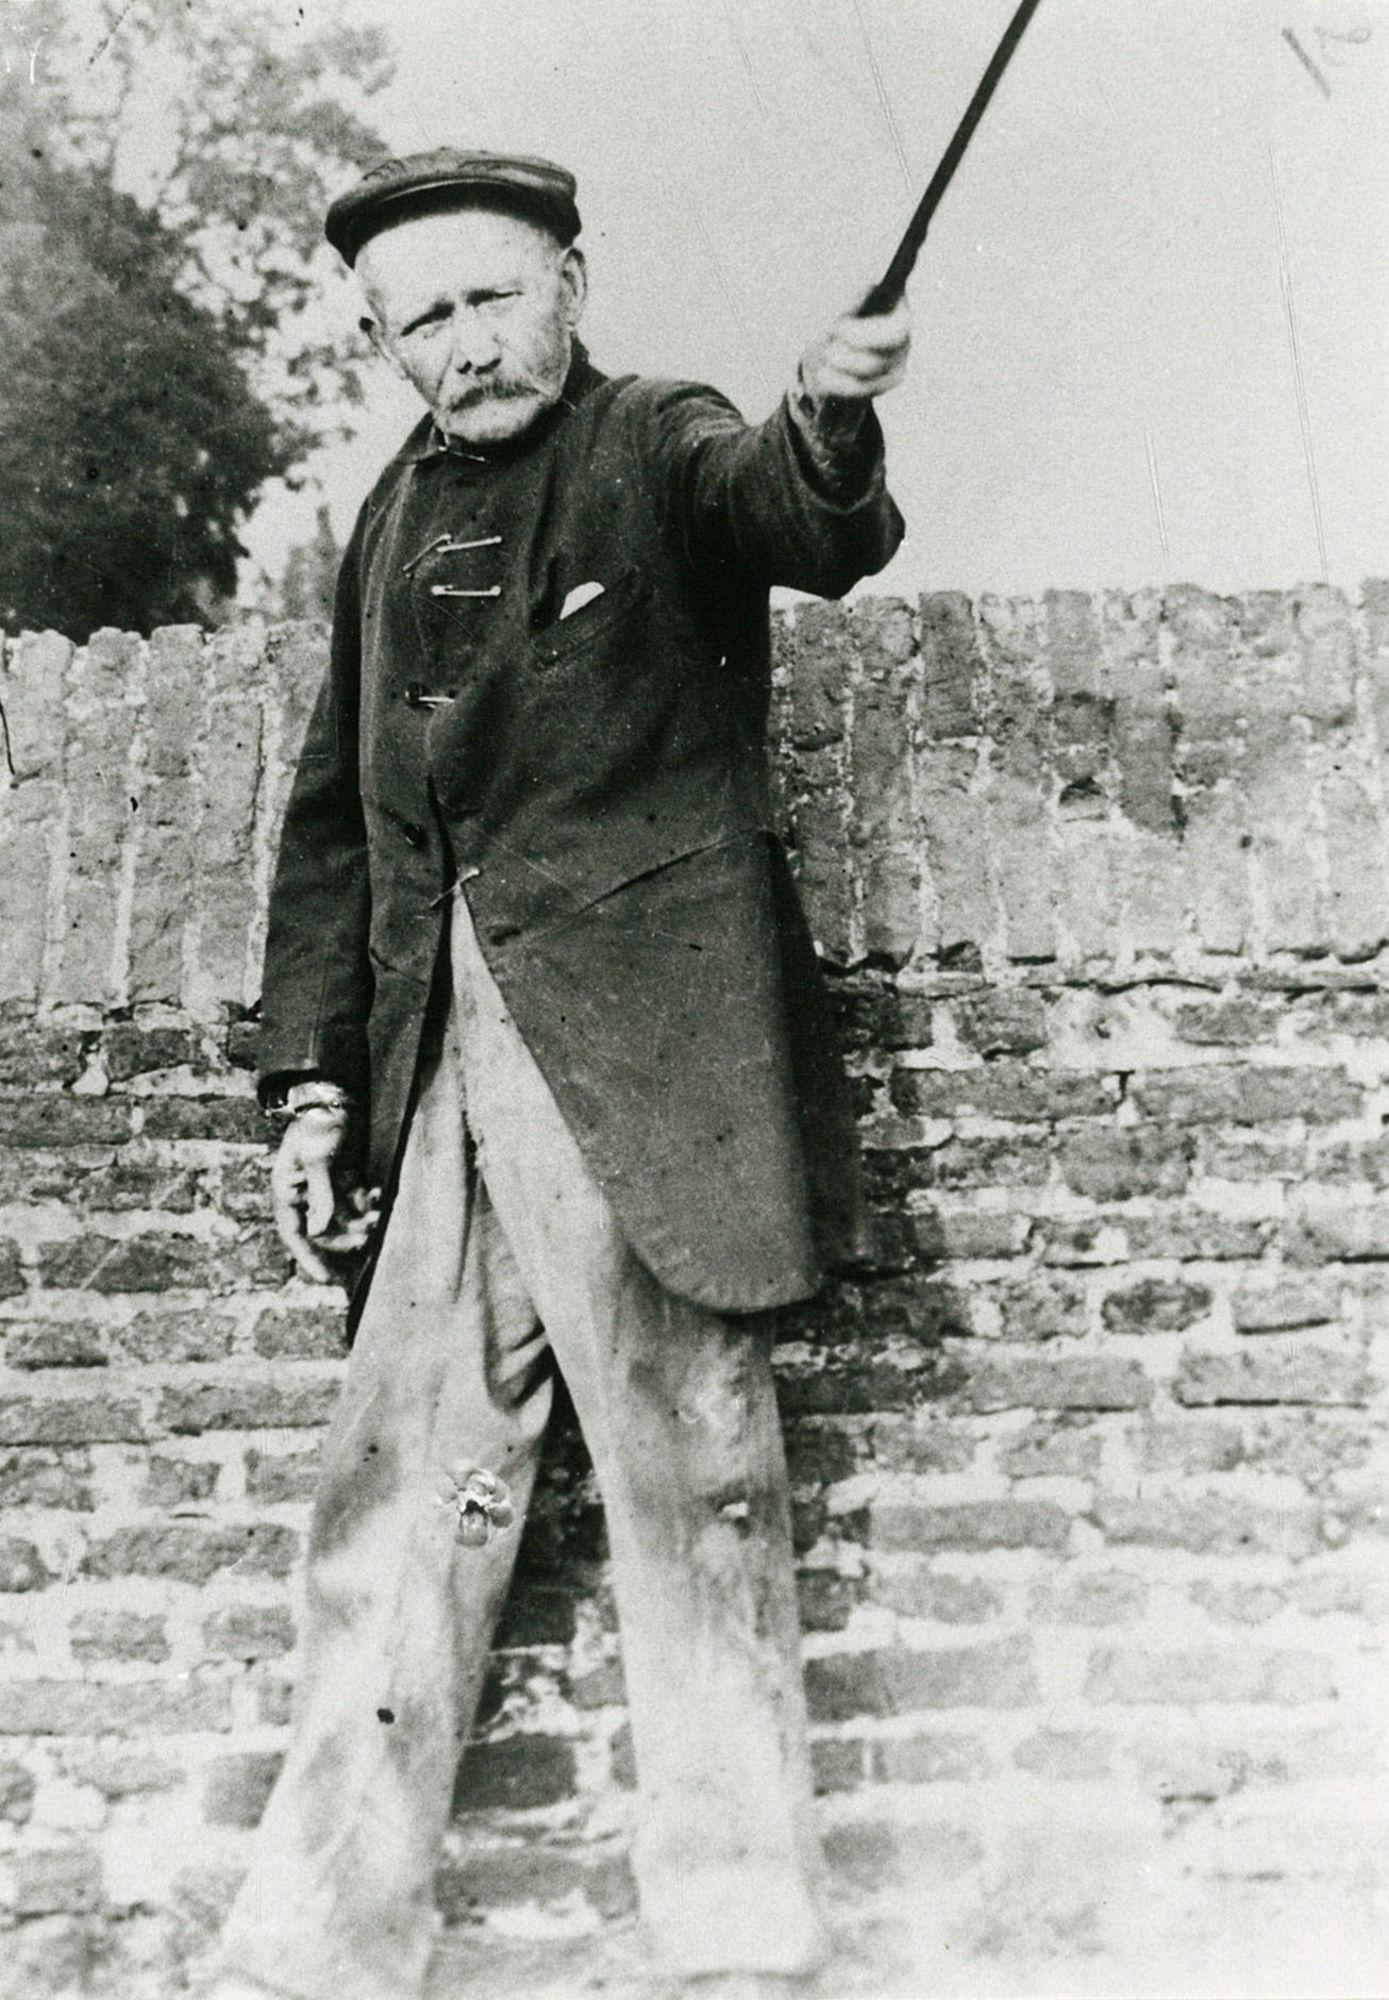 Eduard Stillatus of Natus Beuse